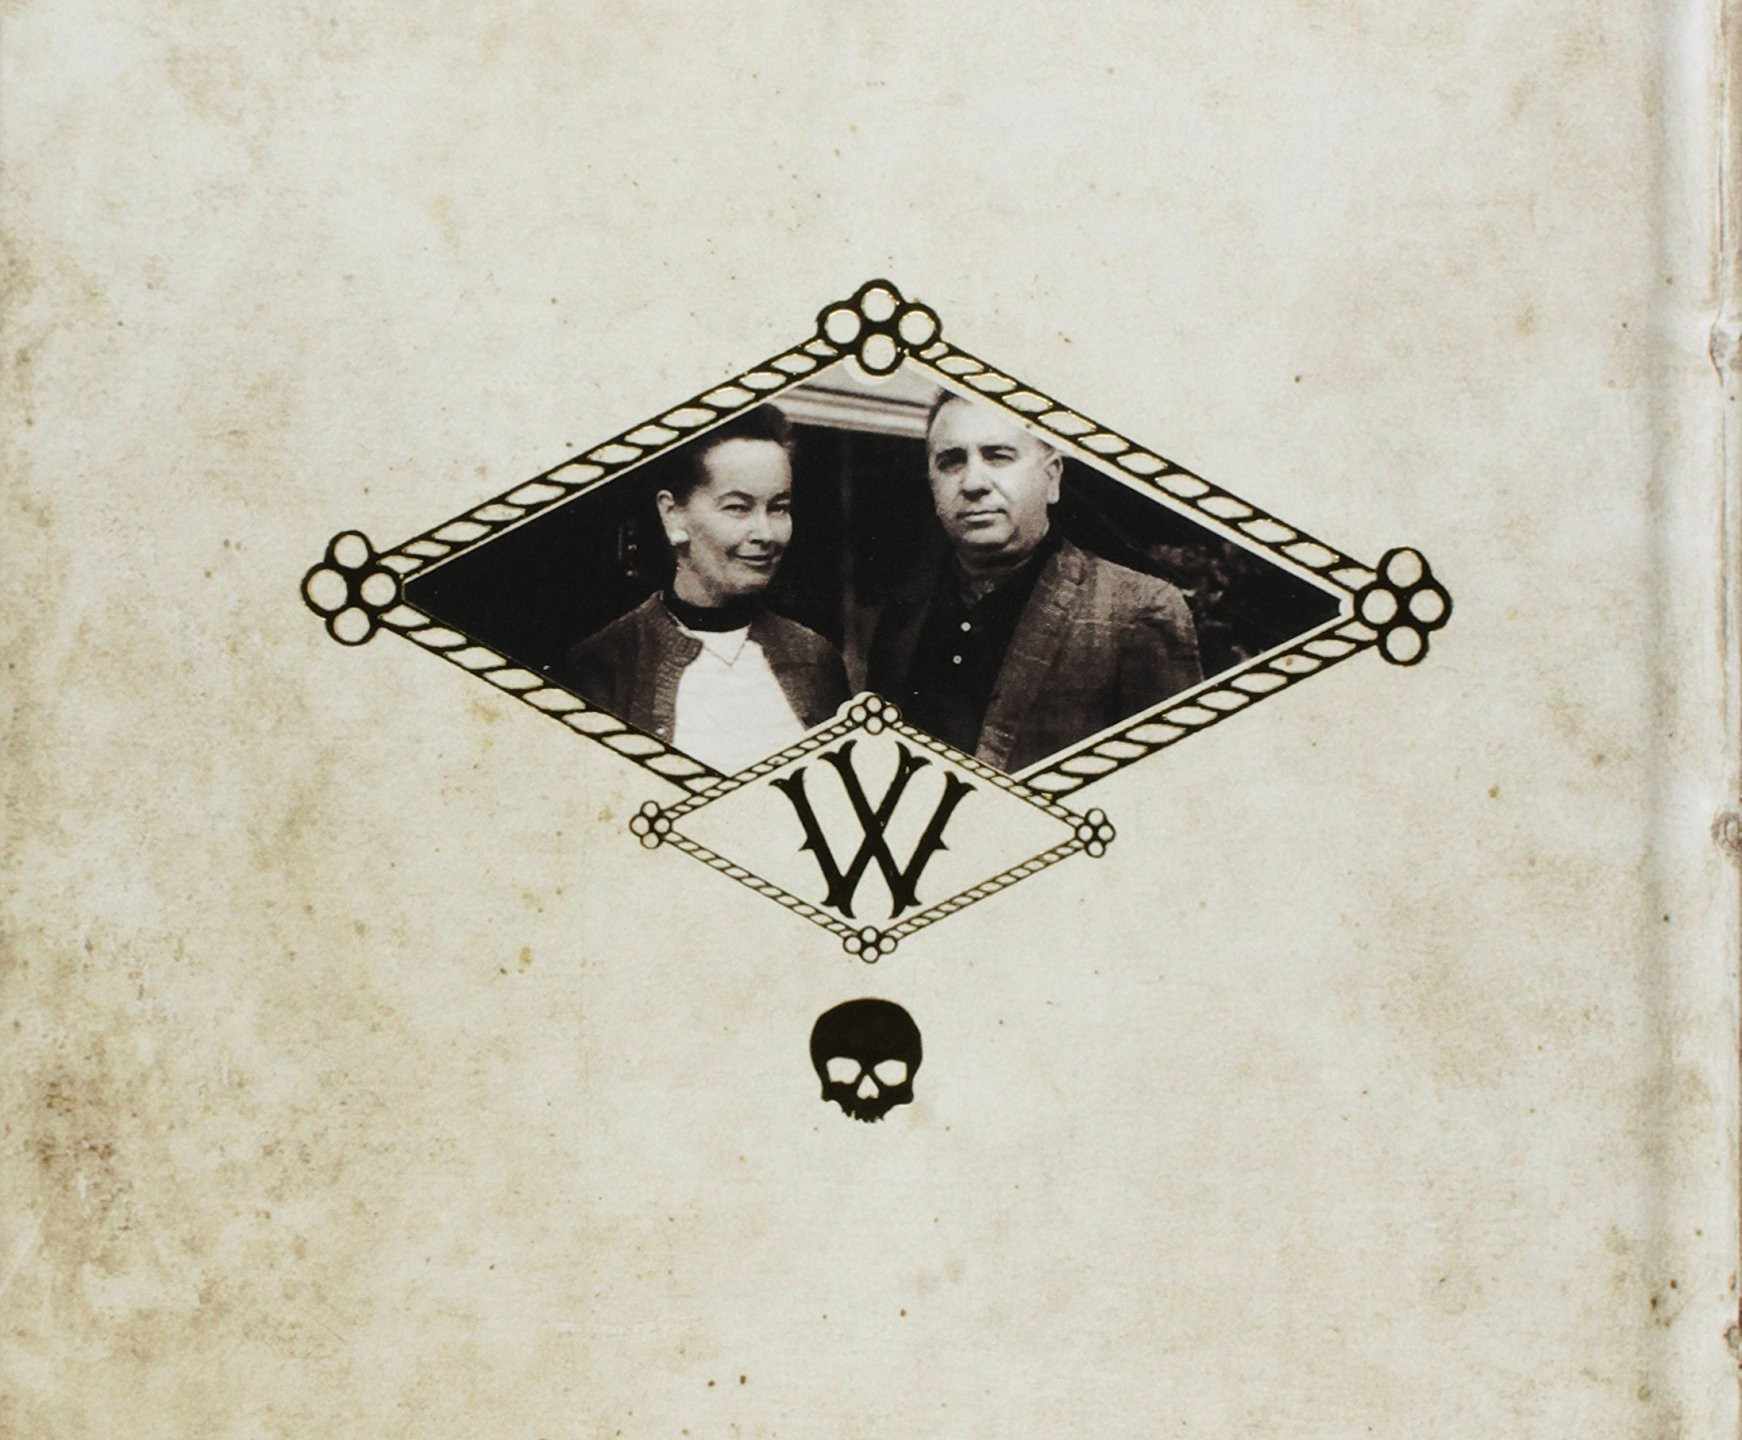 Ed & Lorraine Warren - Demonologistas Arquivos Sobrenaturais 1